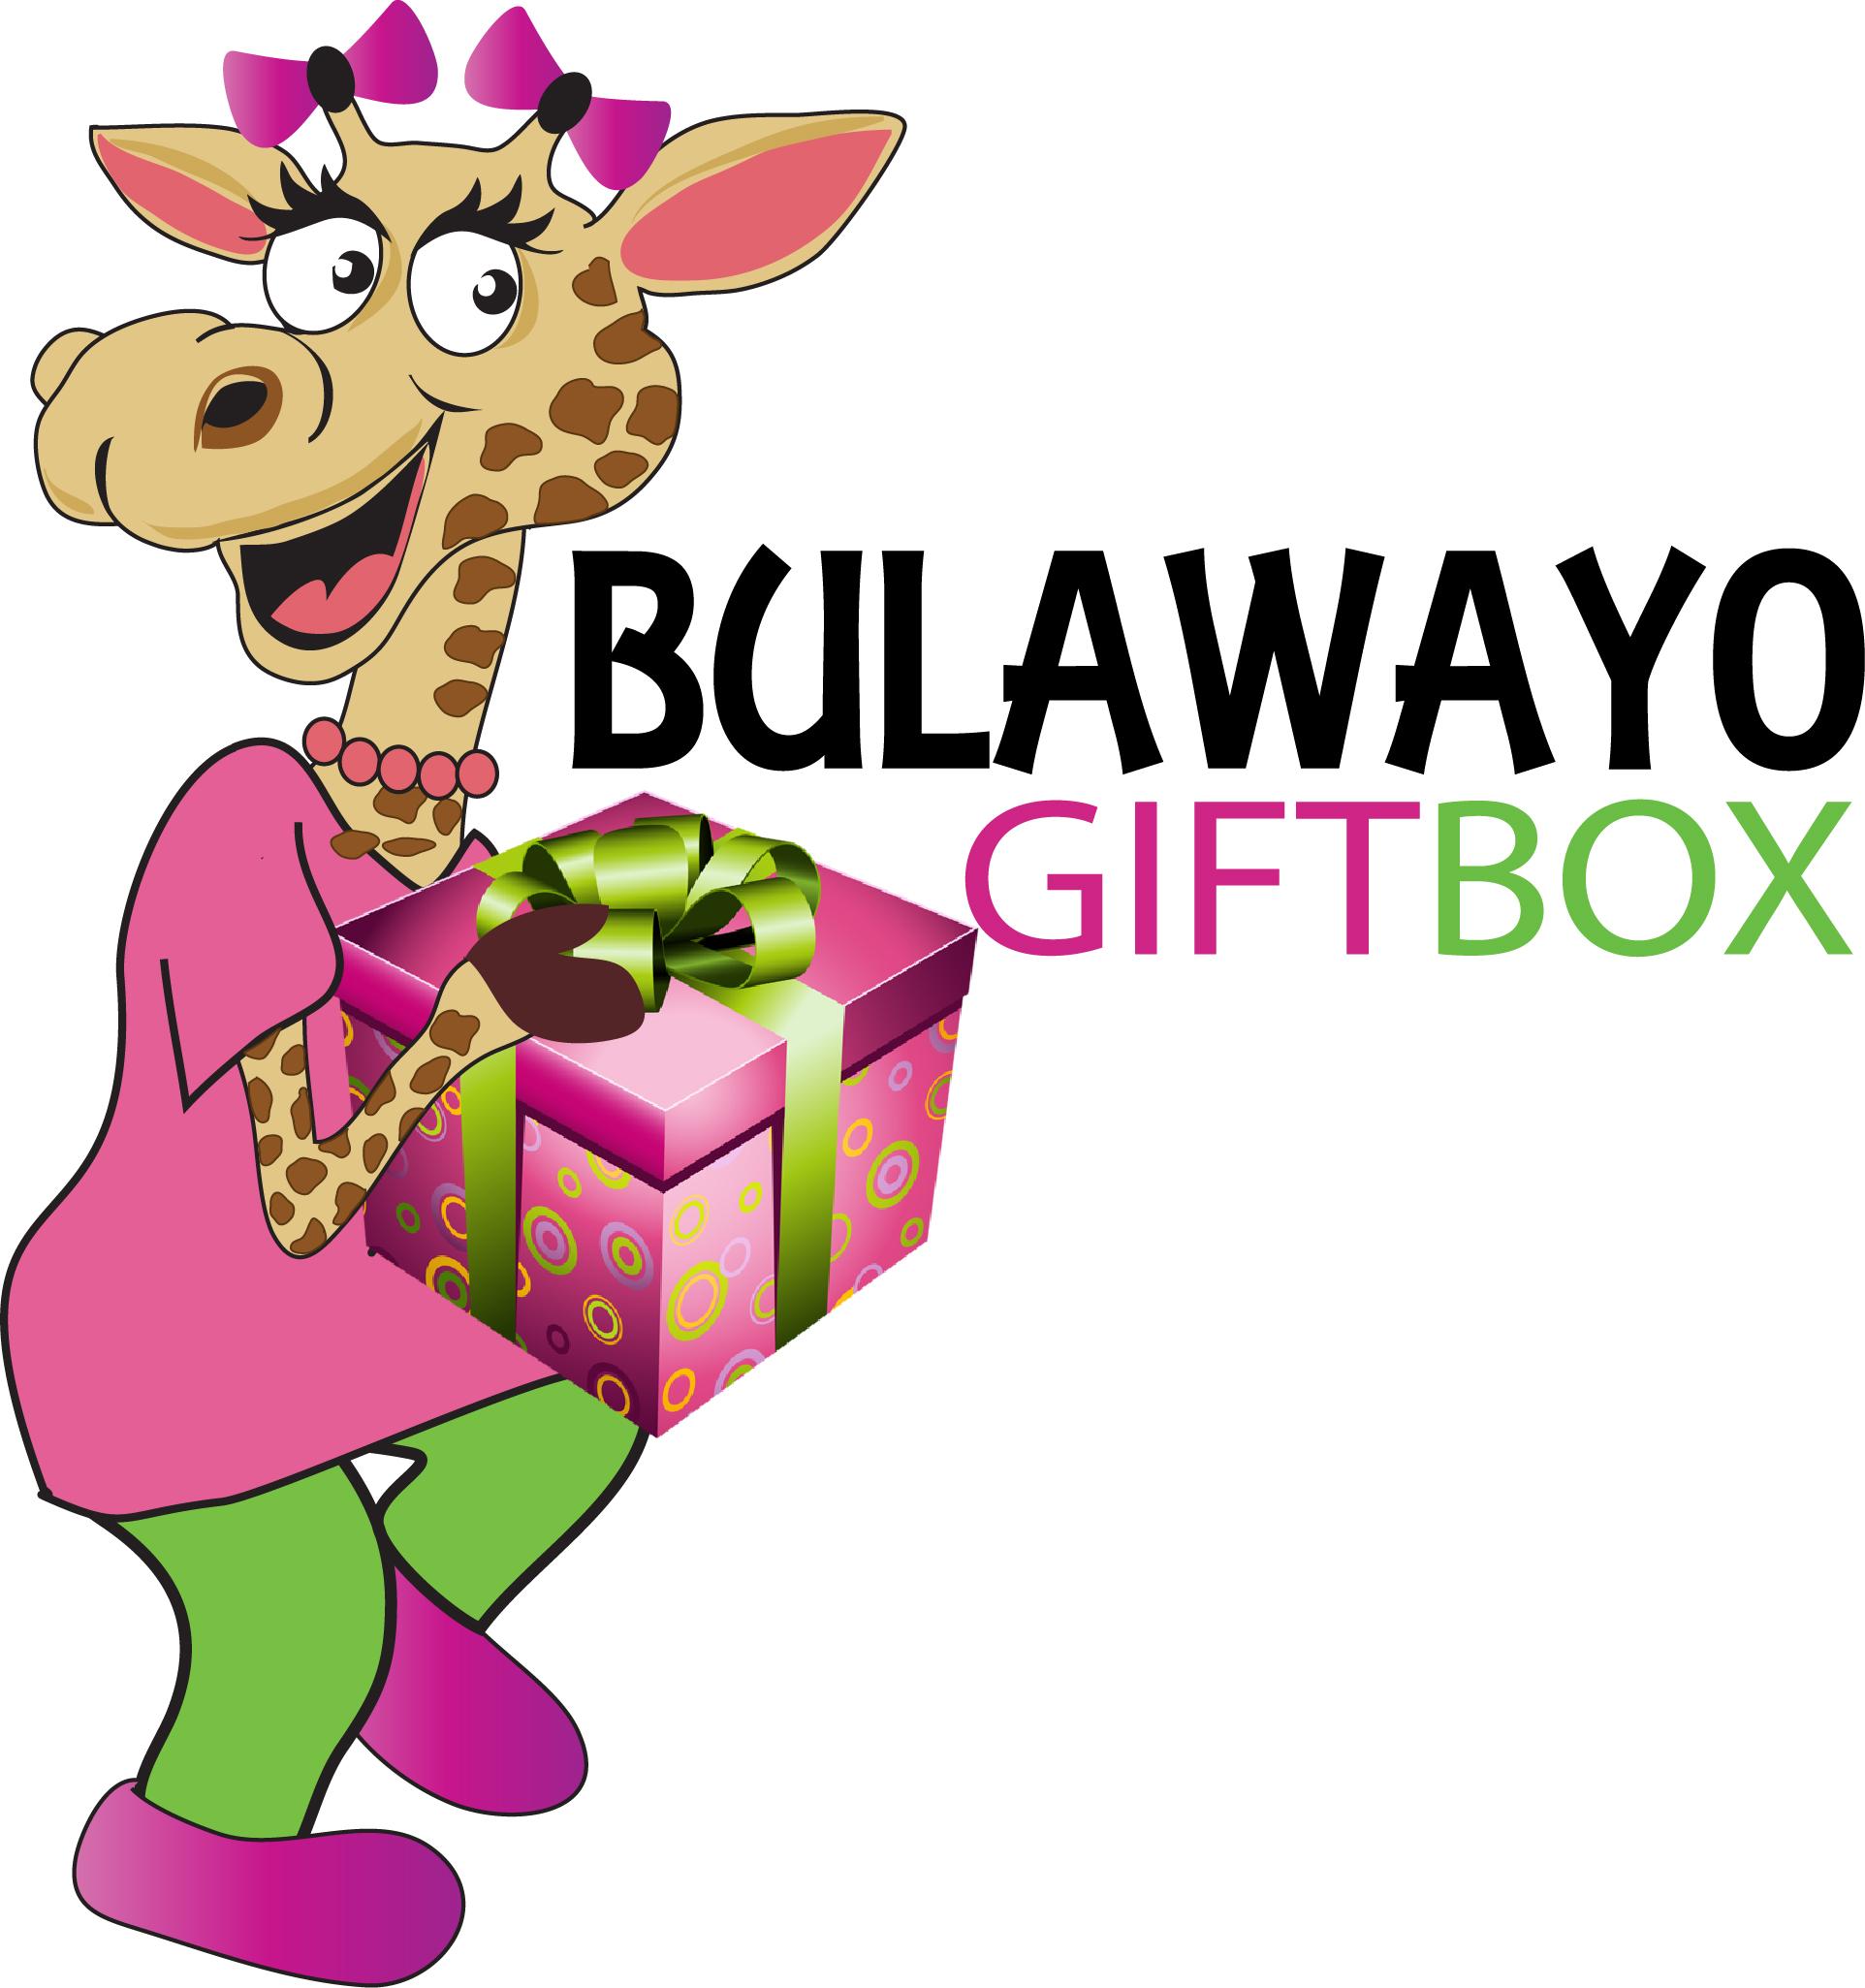 Bulawayo Gift Box.